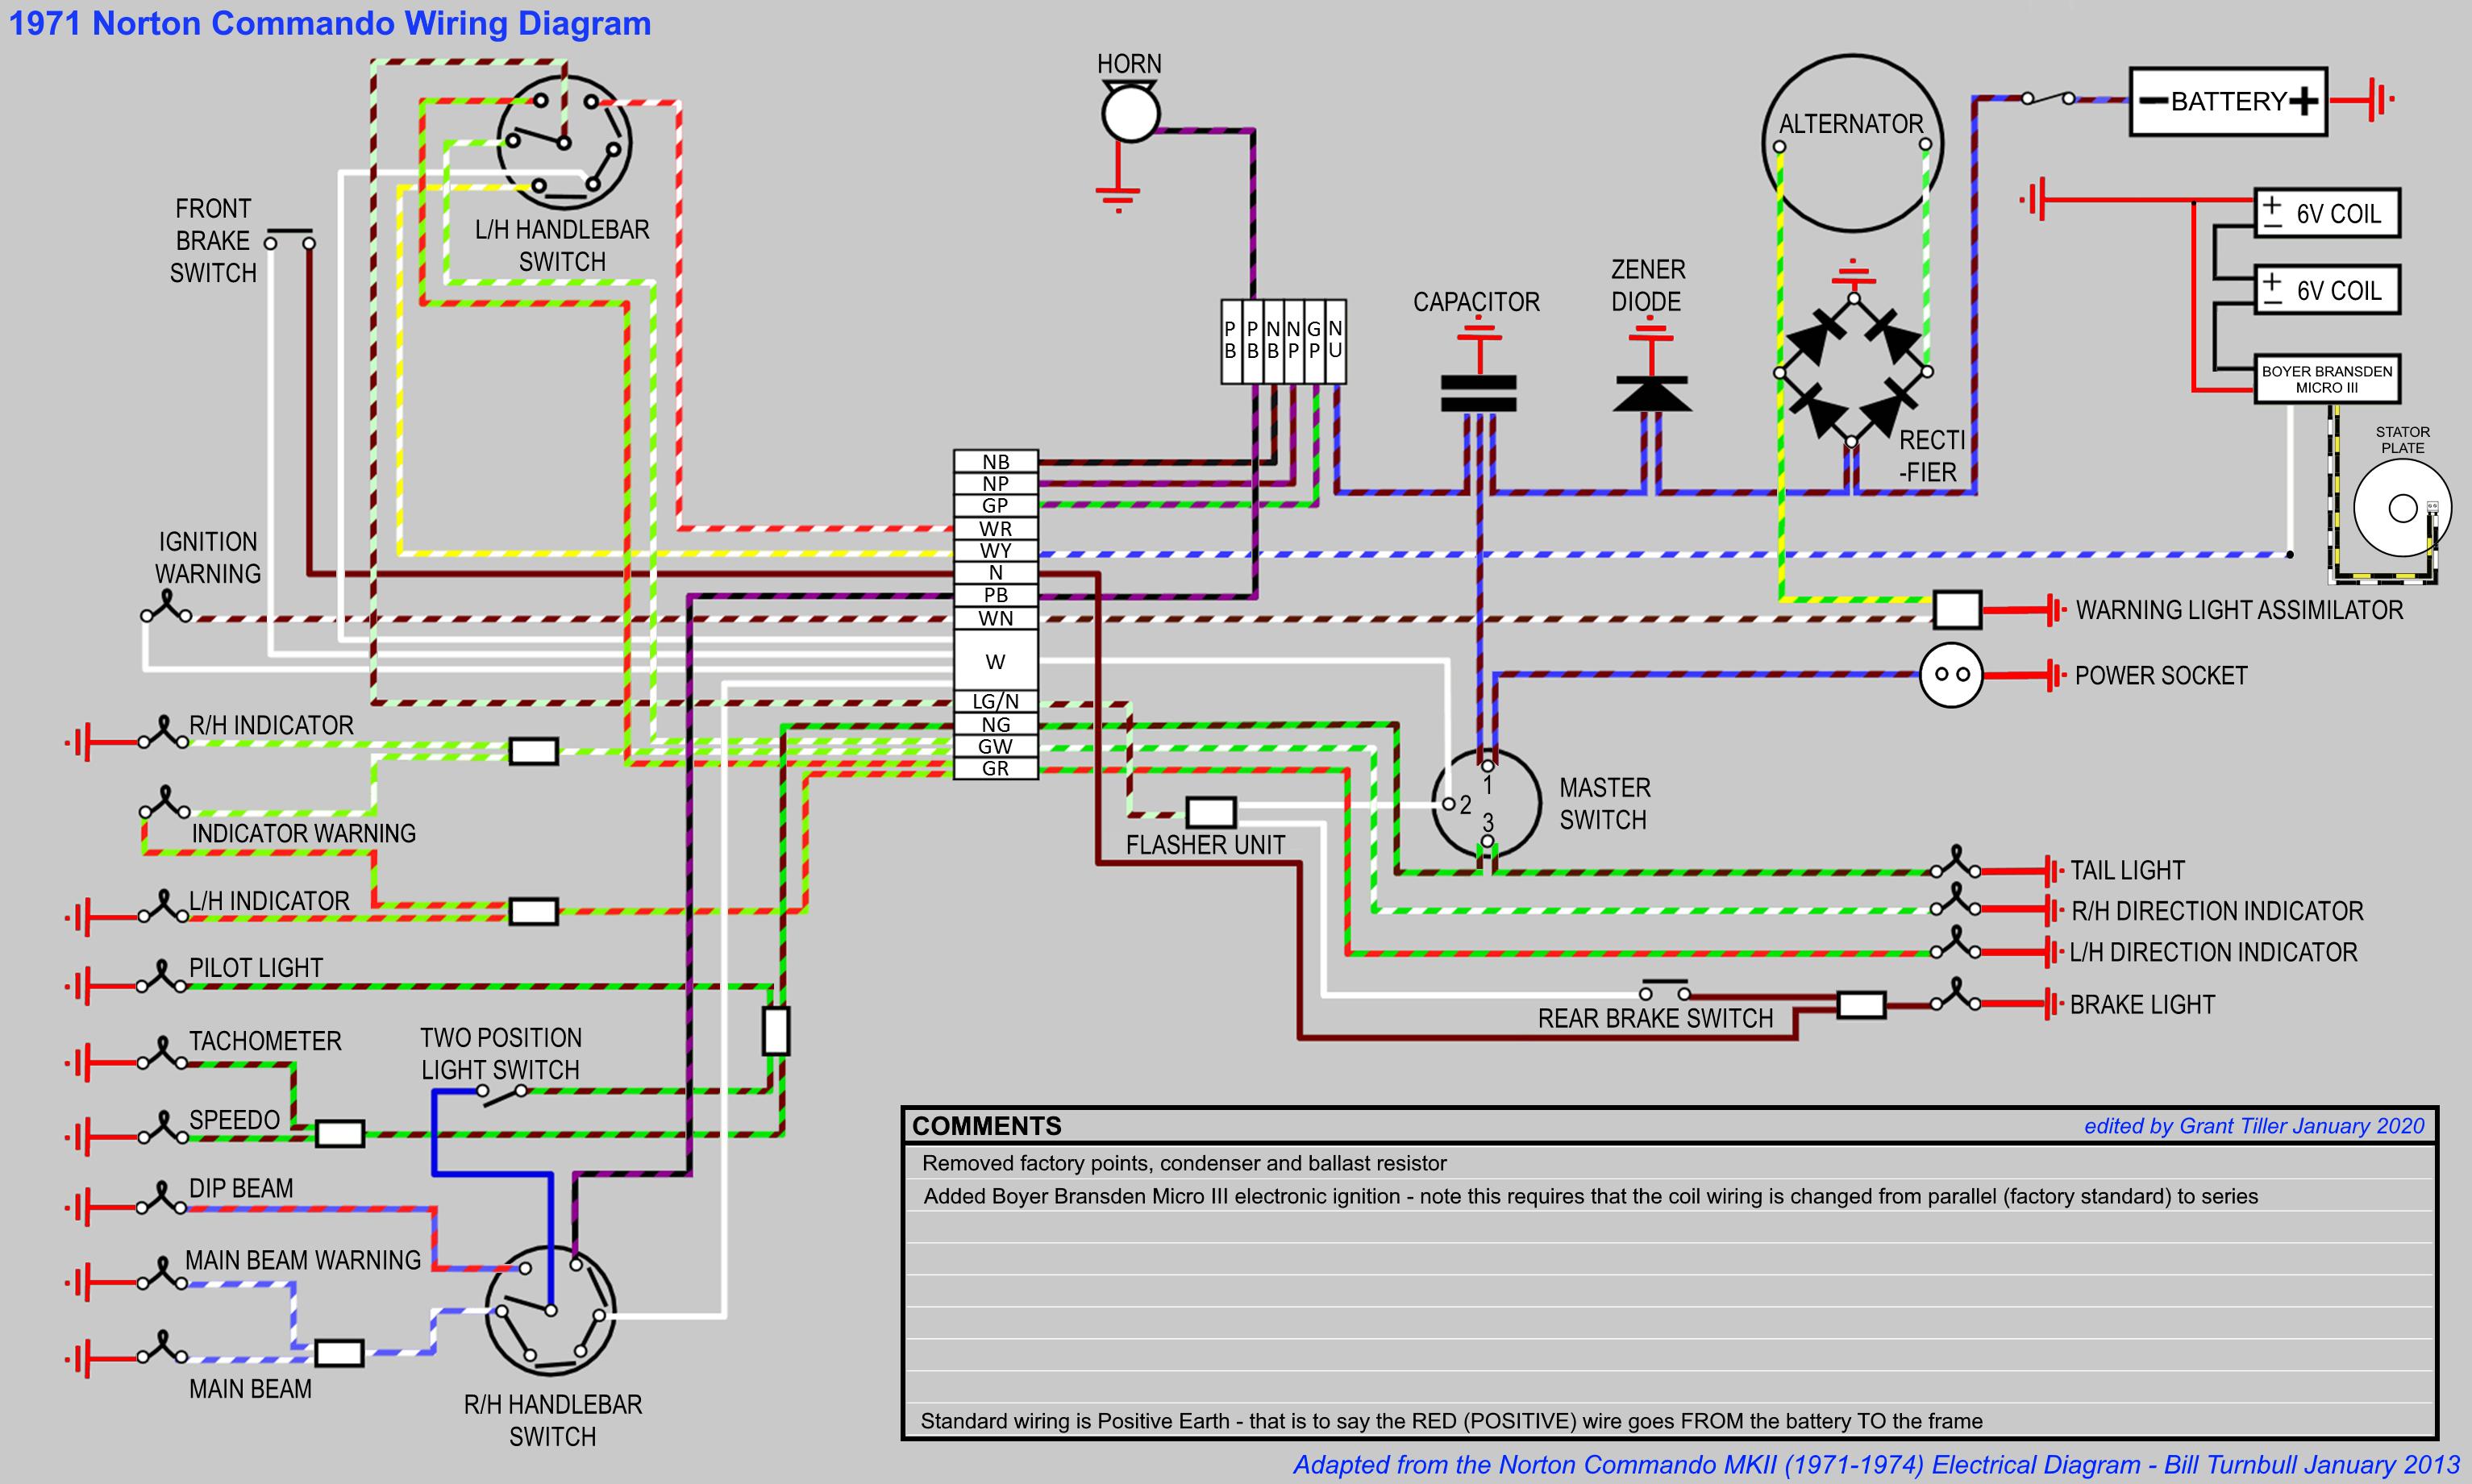 Norton Commando Wiring Diagram + BoyerGrant Tiller